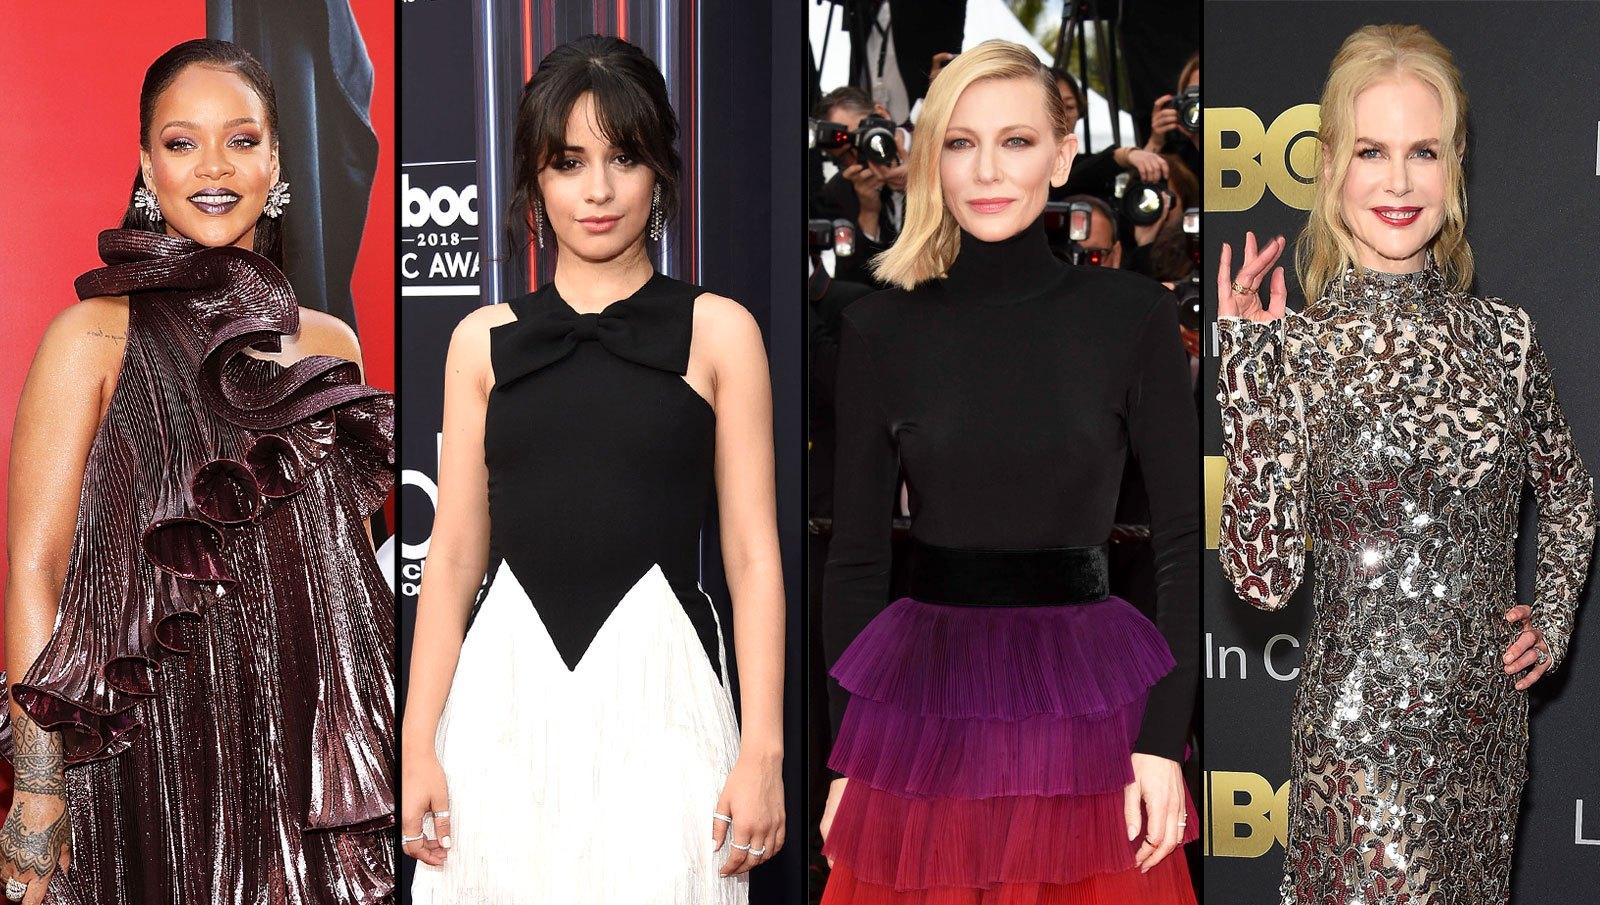 Rihanna, Camila Cabello, Cate Blanchett, Nicole Kidman